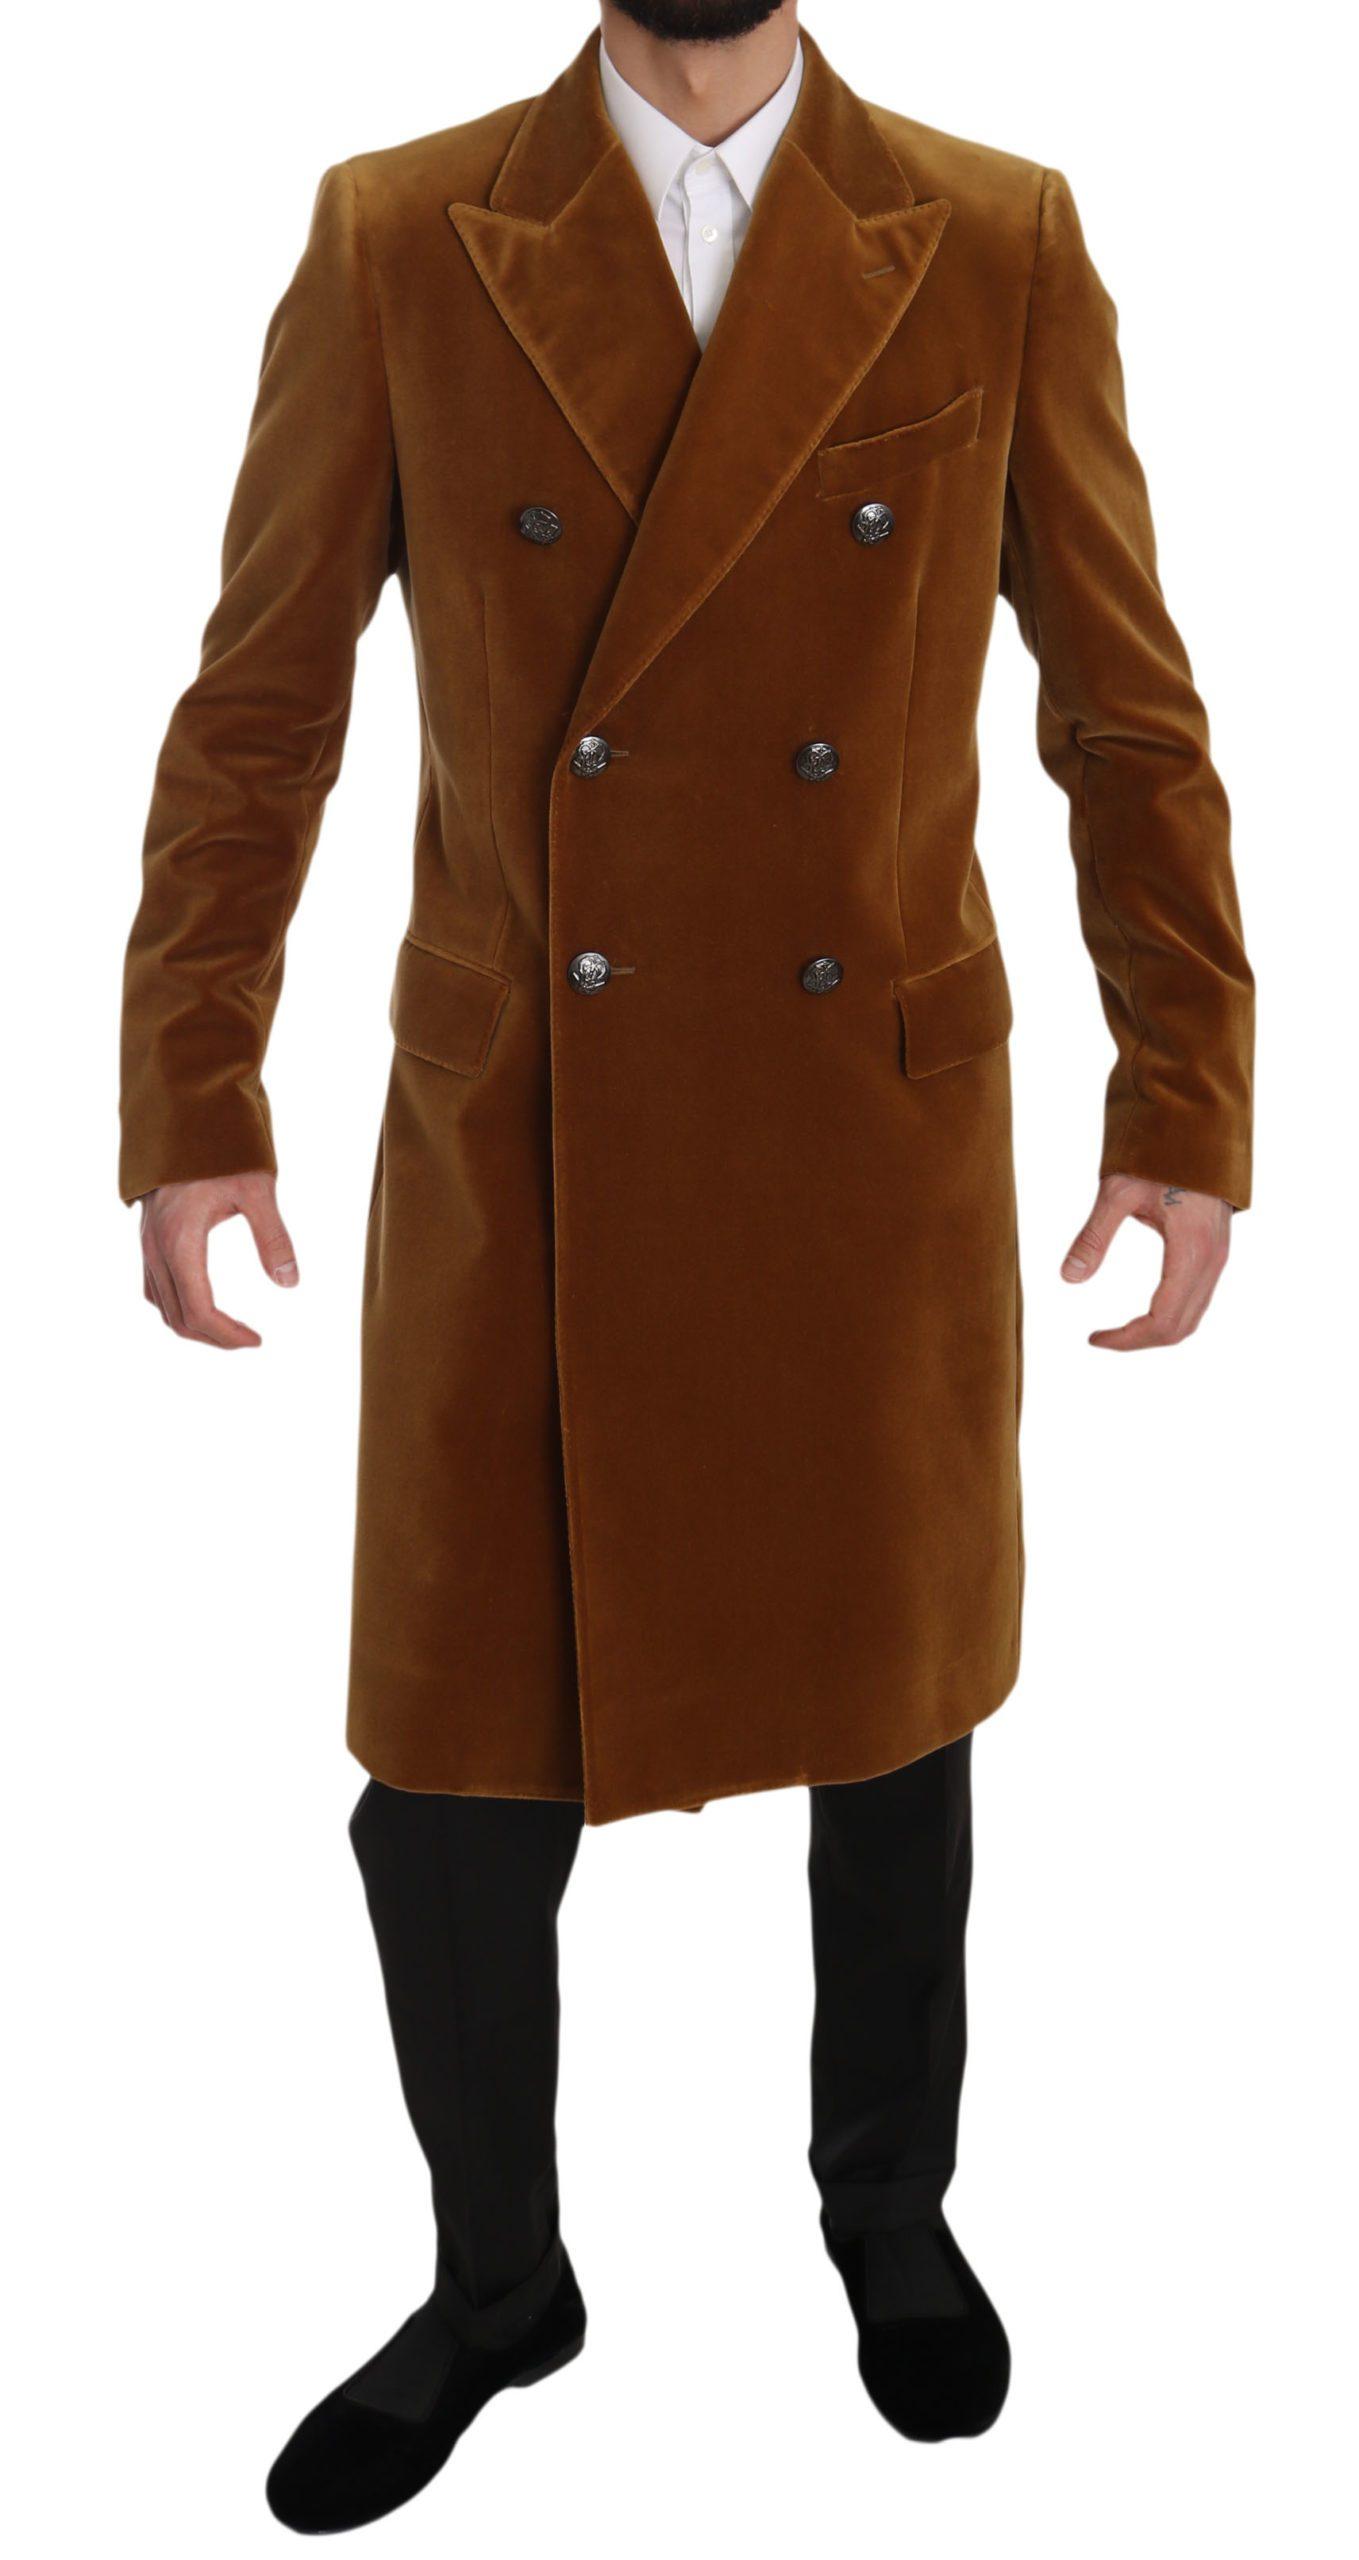 Dolce & Gabbana Men's Jacket Yellow JKT2389 - IT48   M